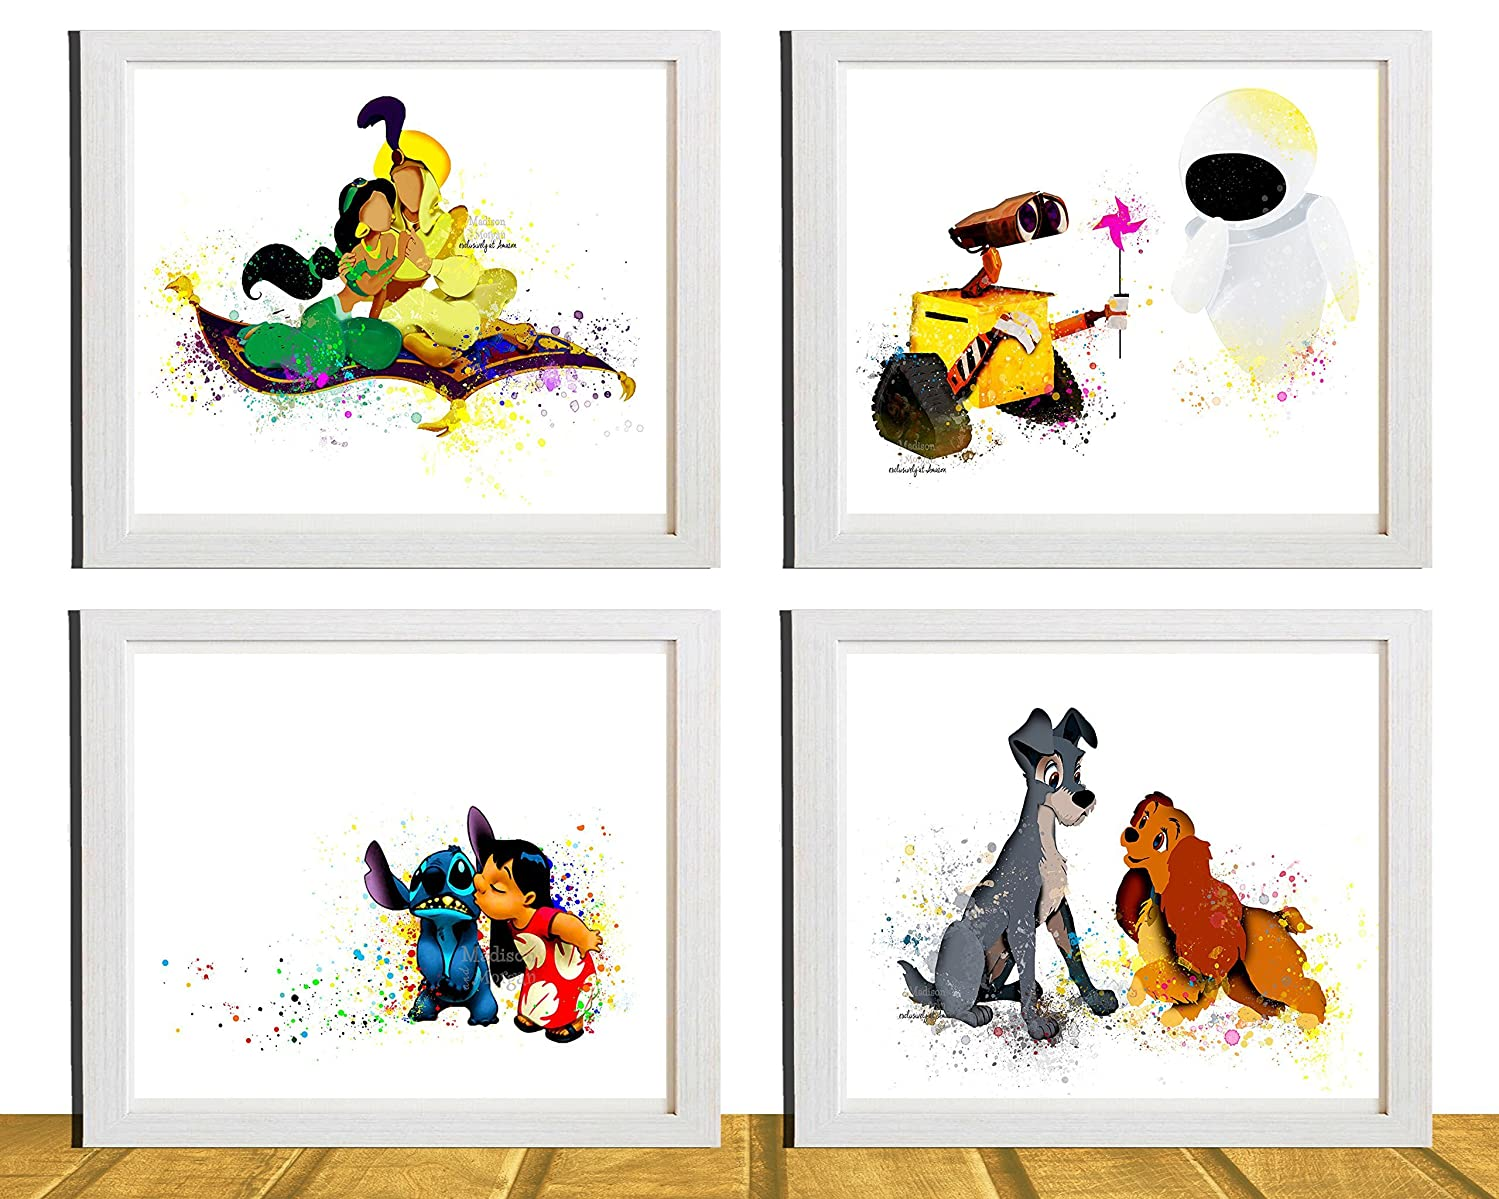 4 piece set (for the price of 3) - Disney Movie Art Prints - Nursery Decor - Wall Decor - Kids Decor - Watercolor Effect - Kids Wall Art - 8 X 10 - Unframed - Printed on Matte Photo Paper